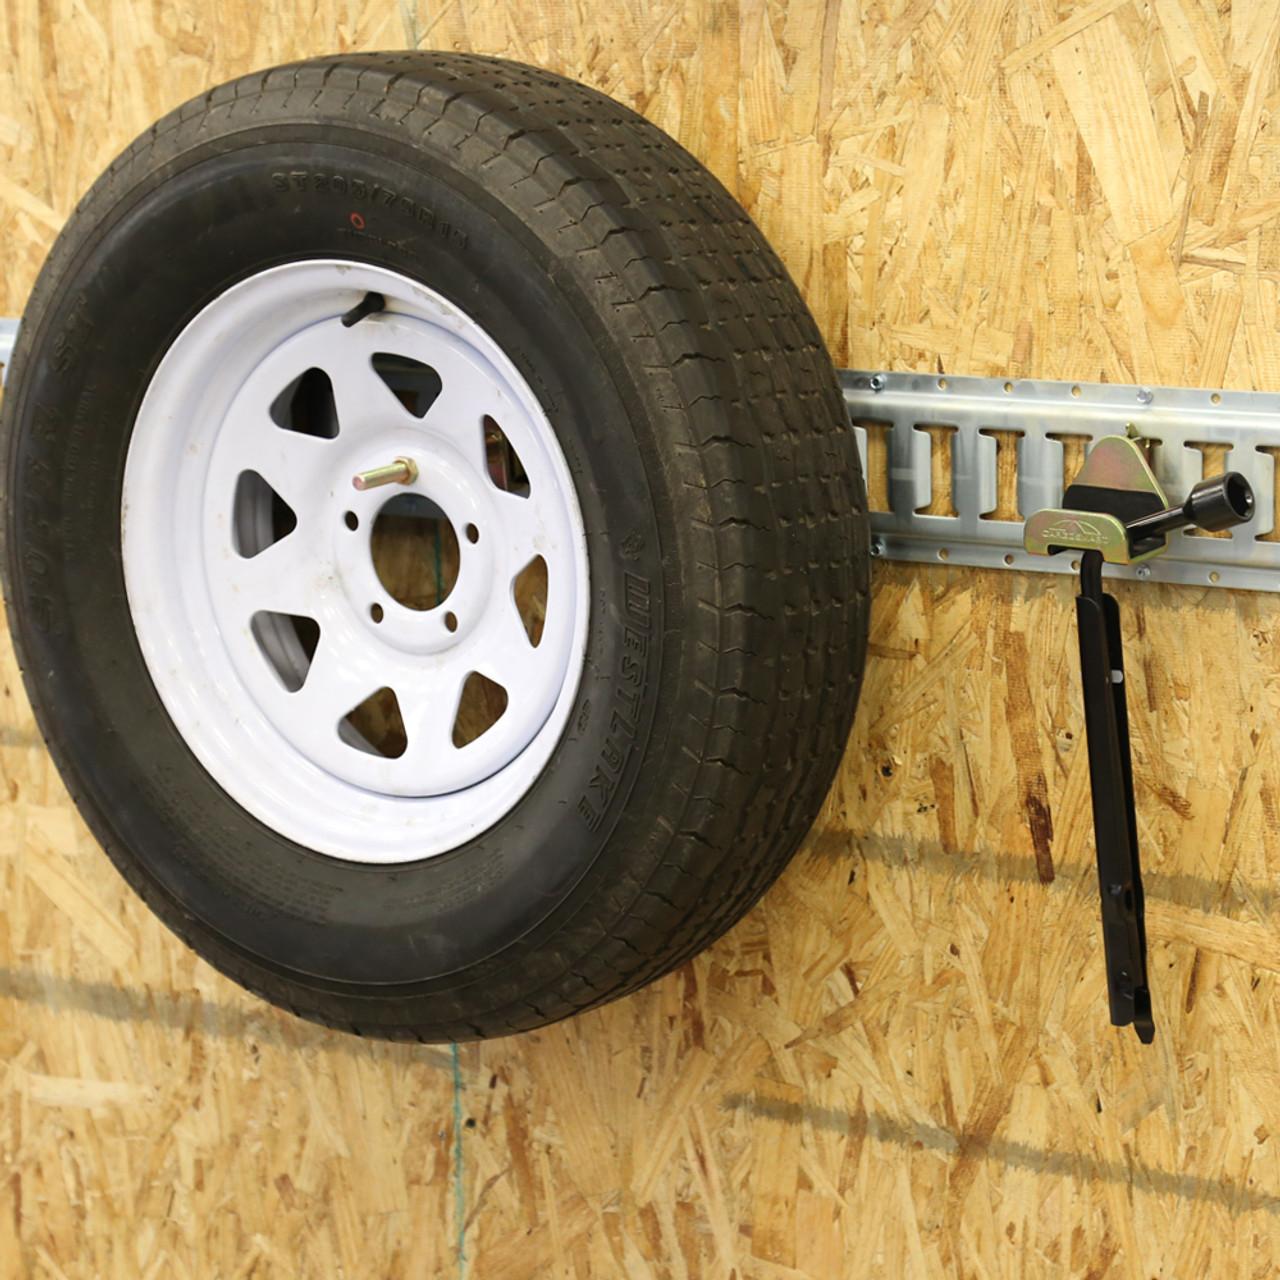 CS1743 --- Spare Tire Holder for E-Track/X-Track Systems